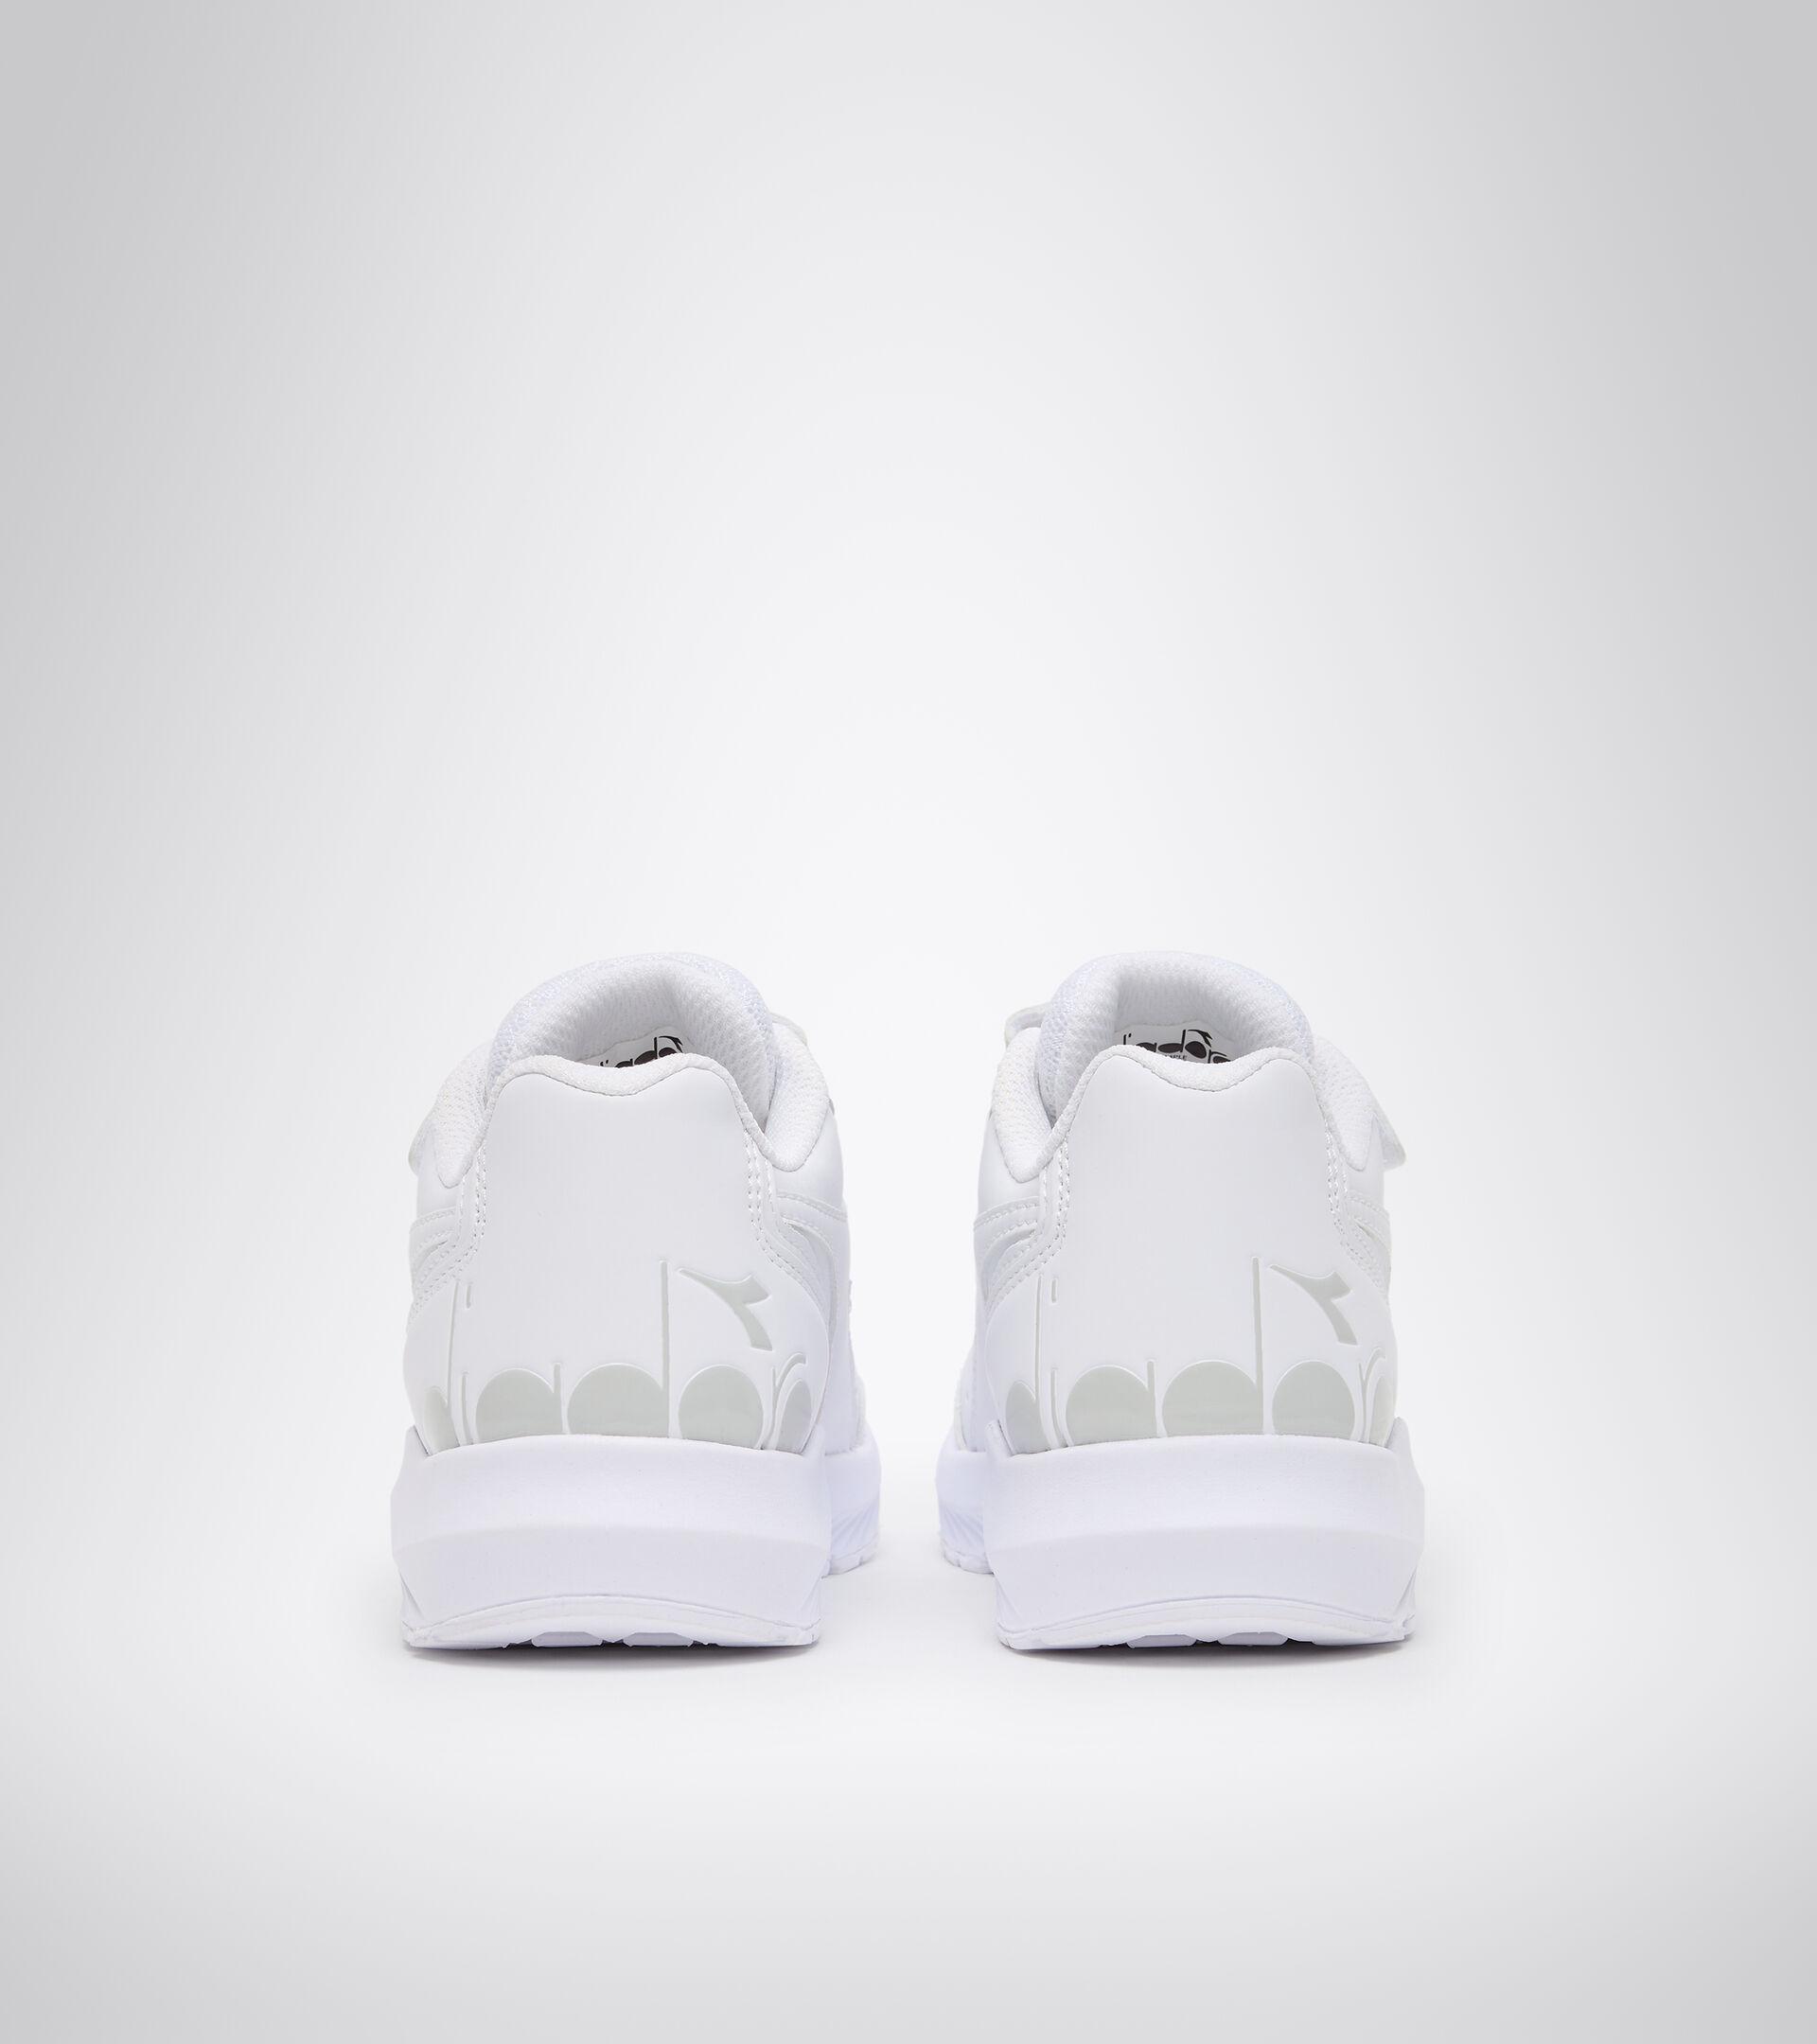 Chaussures de running - Unisexe Enfant FALCON SL JR V BLANC/BLANC/BLANC - Diadora